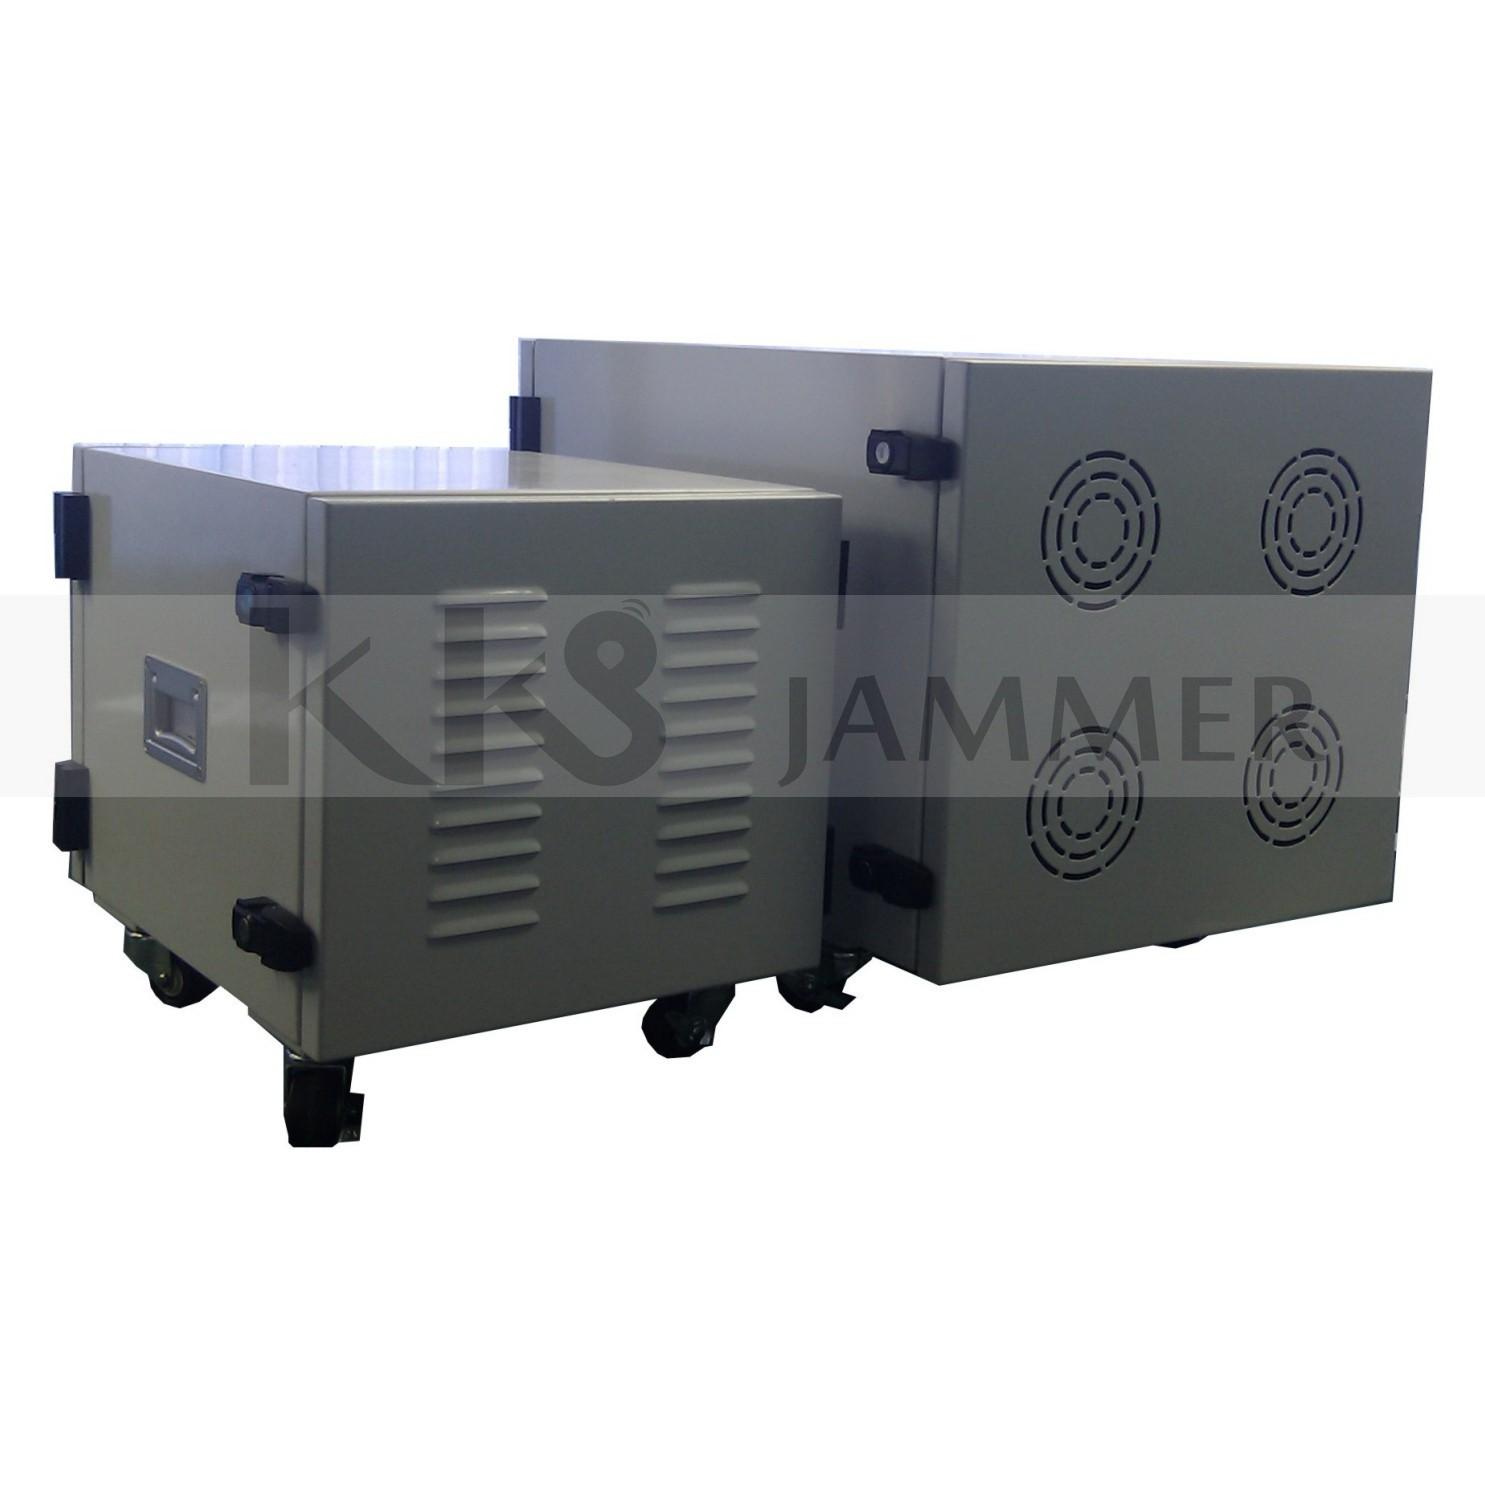 Block signal jammer supplier   Portable Drone Signal Jammer UAV/Drone Signal Jamming System